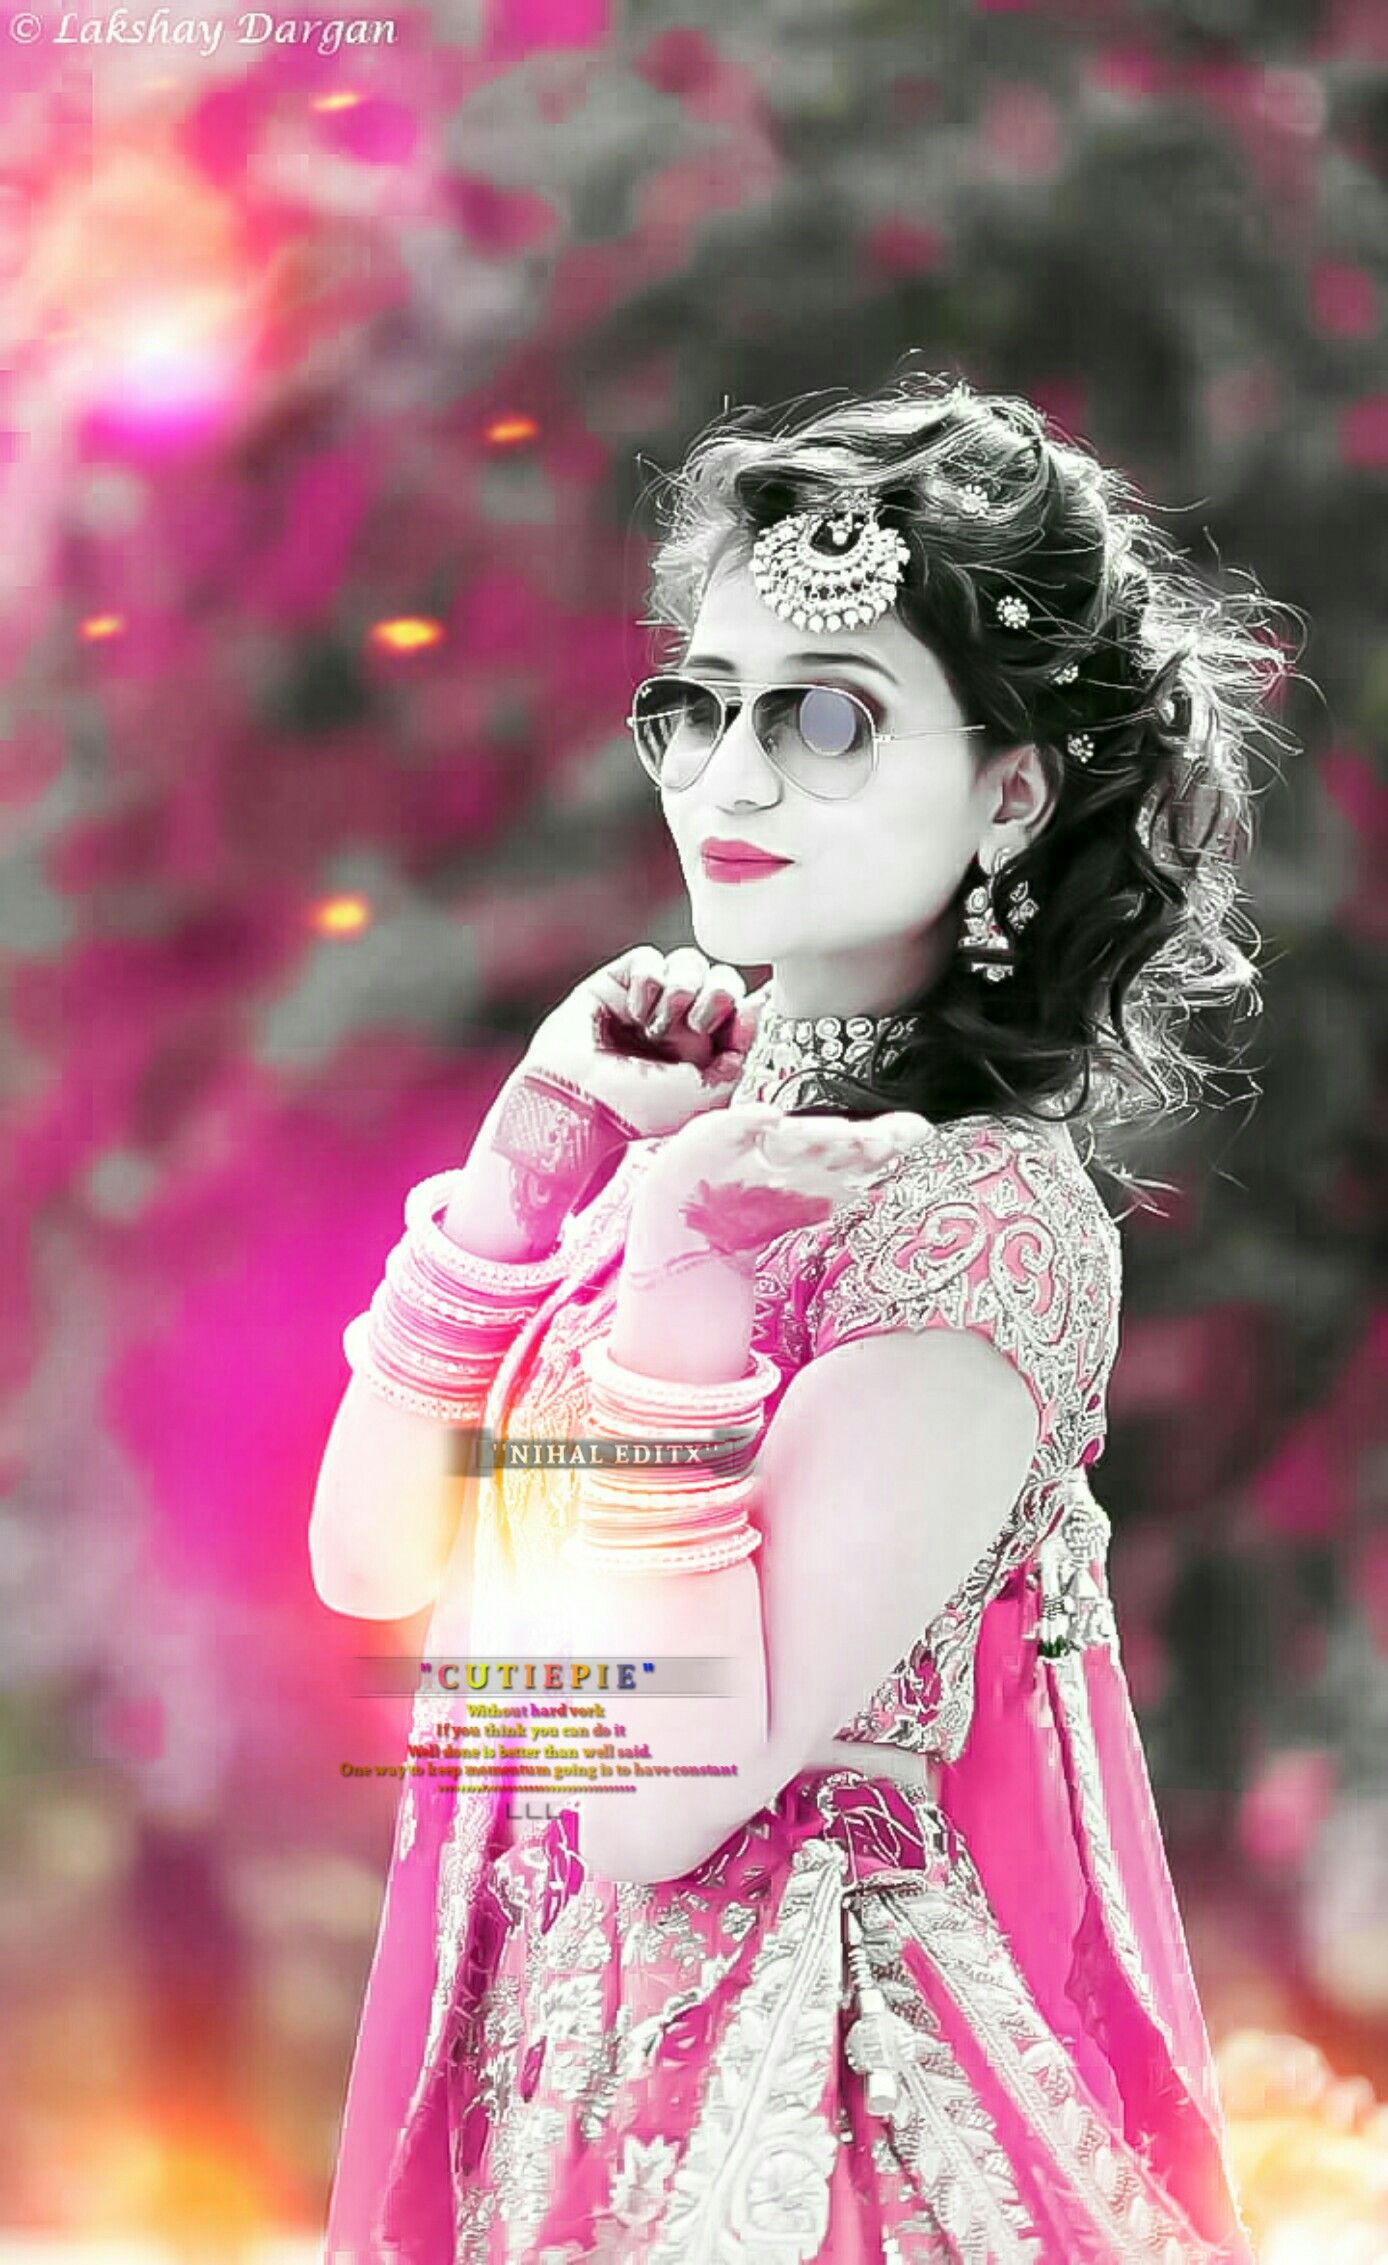 Pin By Nihal Thakur On Editing Dp S Aurora Sleeping Beauty Disney Princess Disney